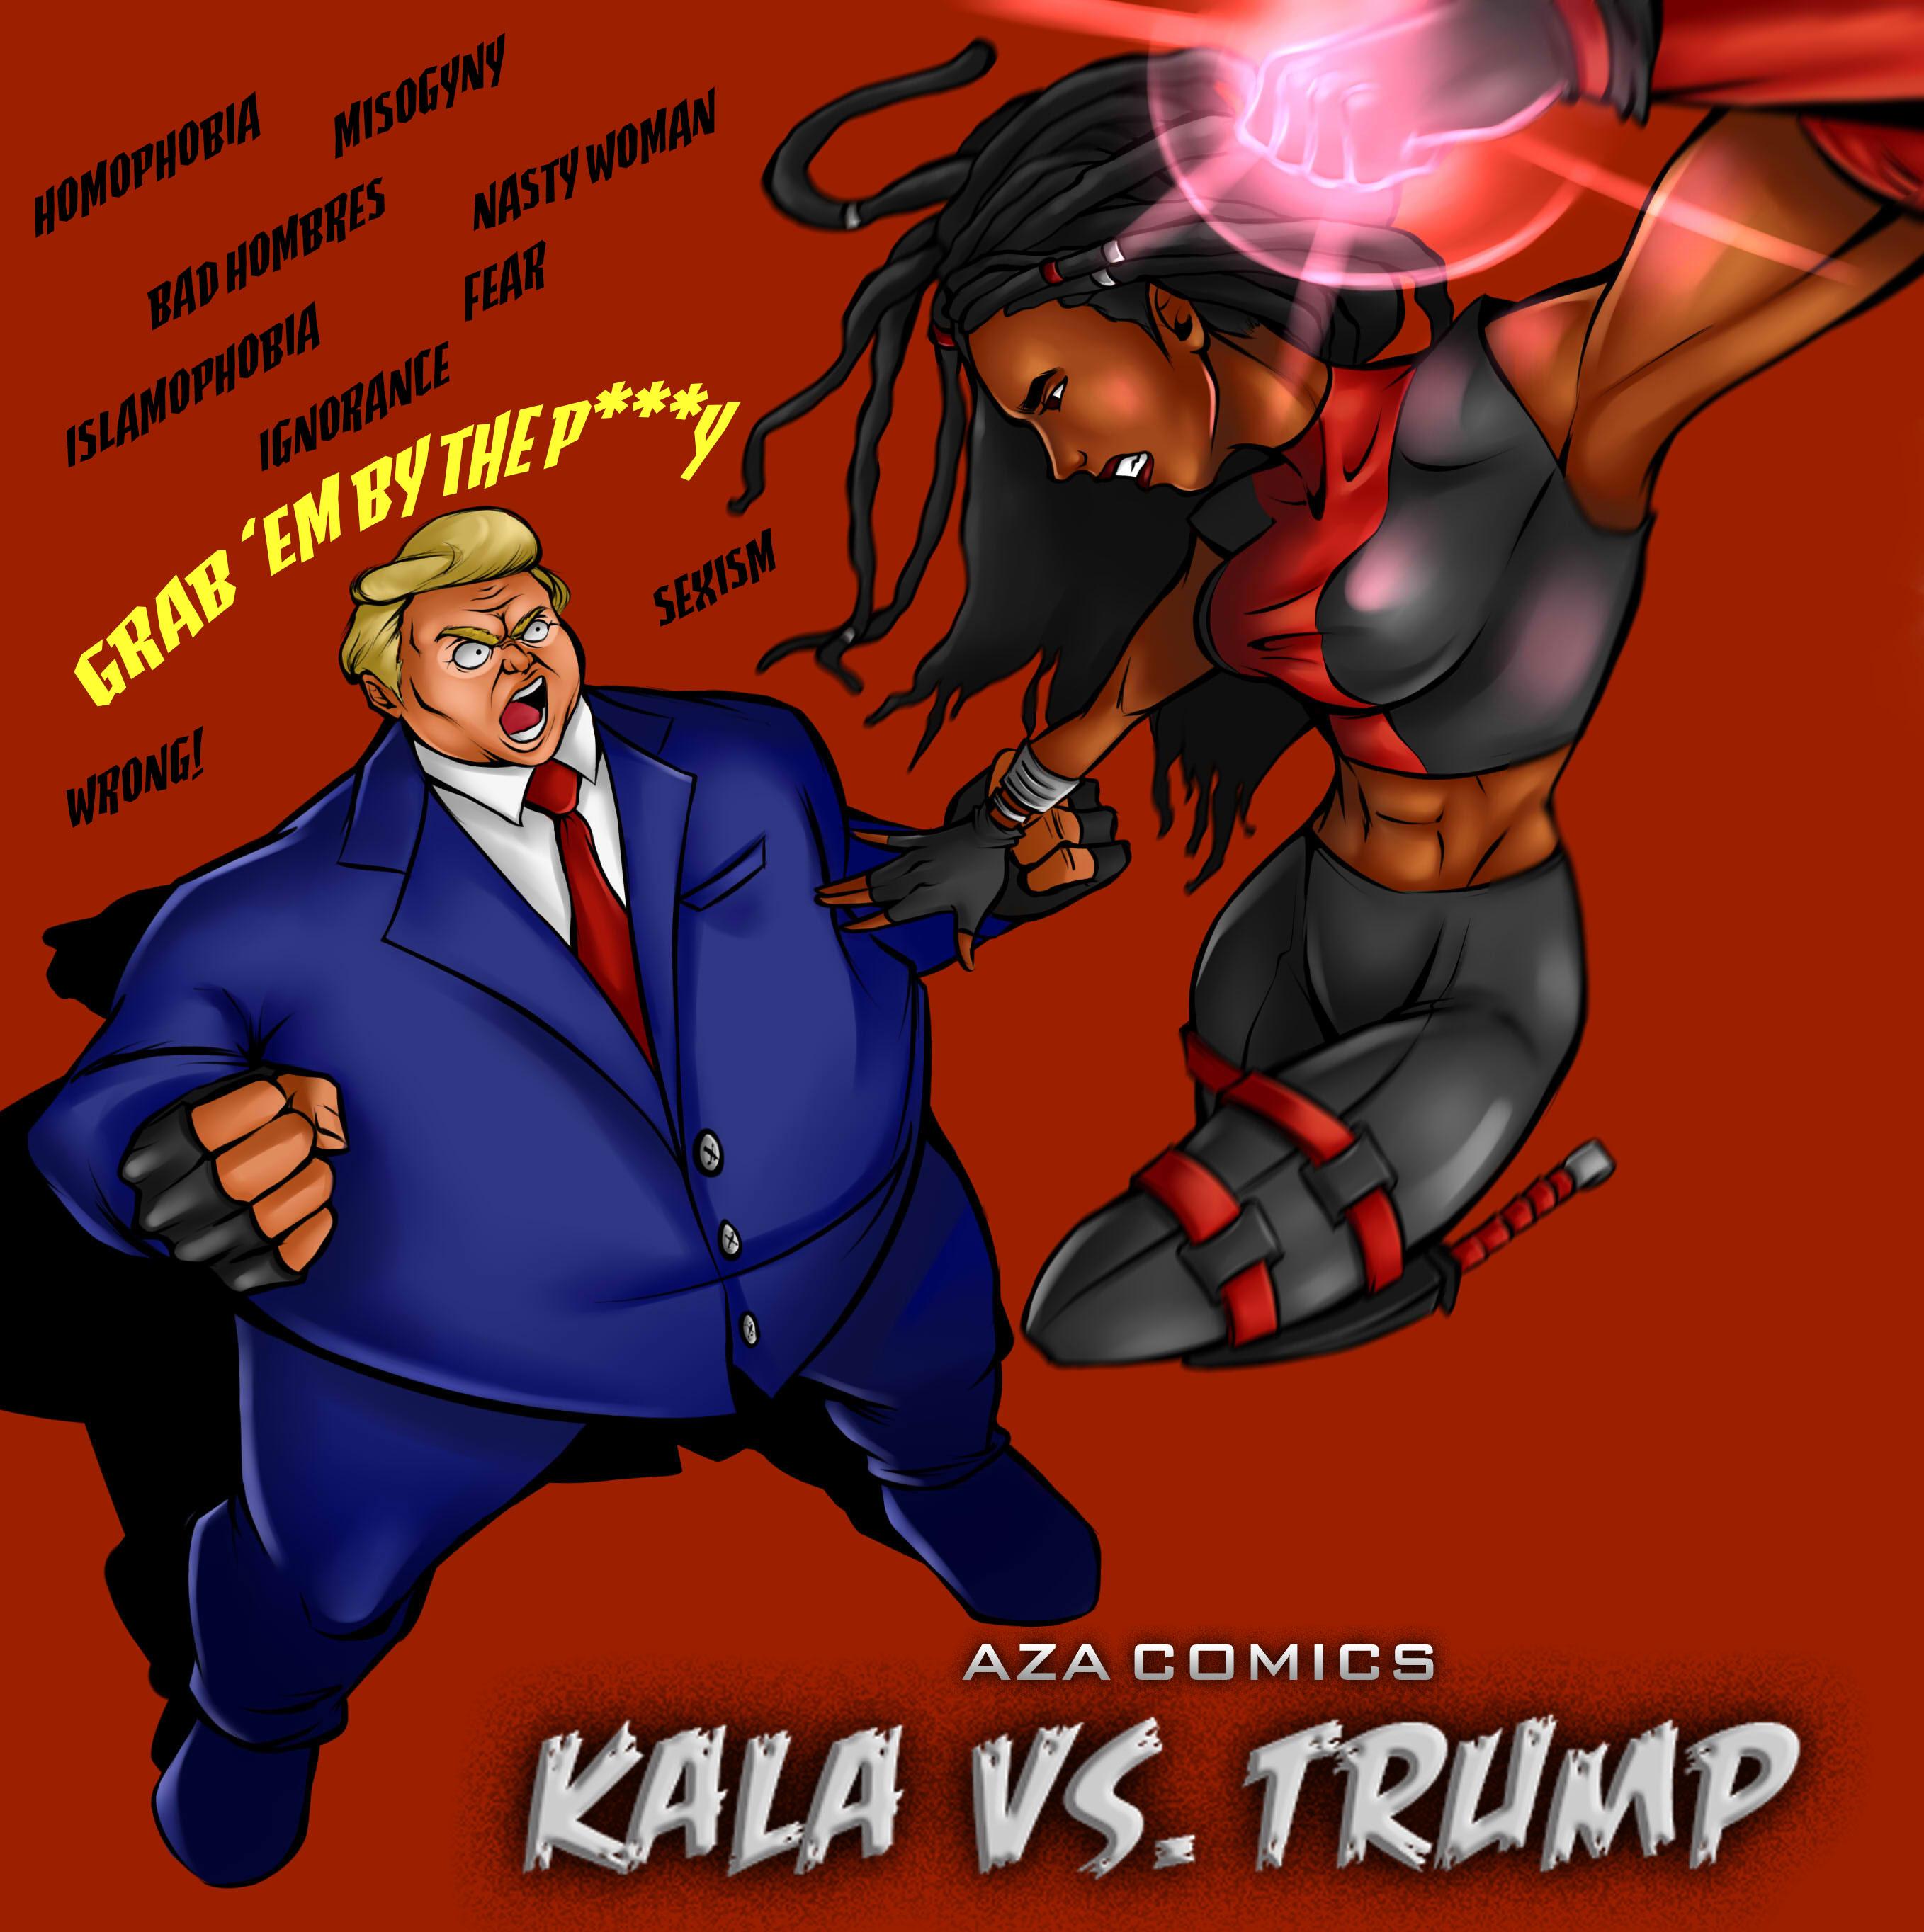 kala-vs-trump